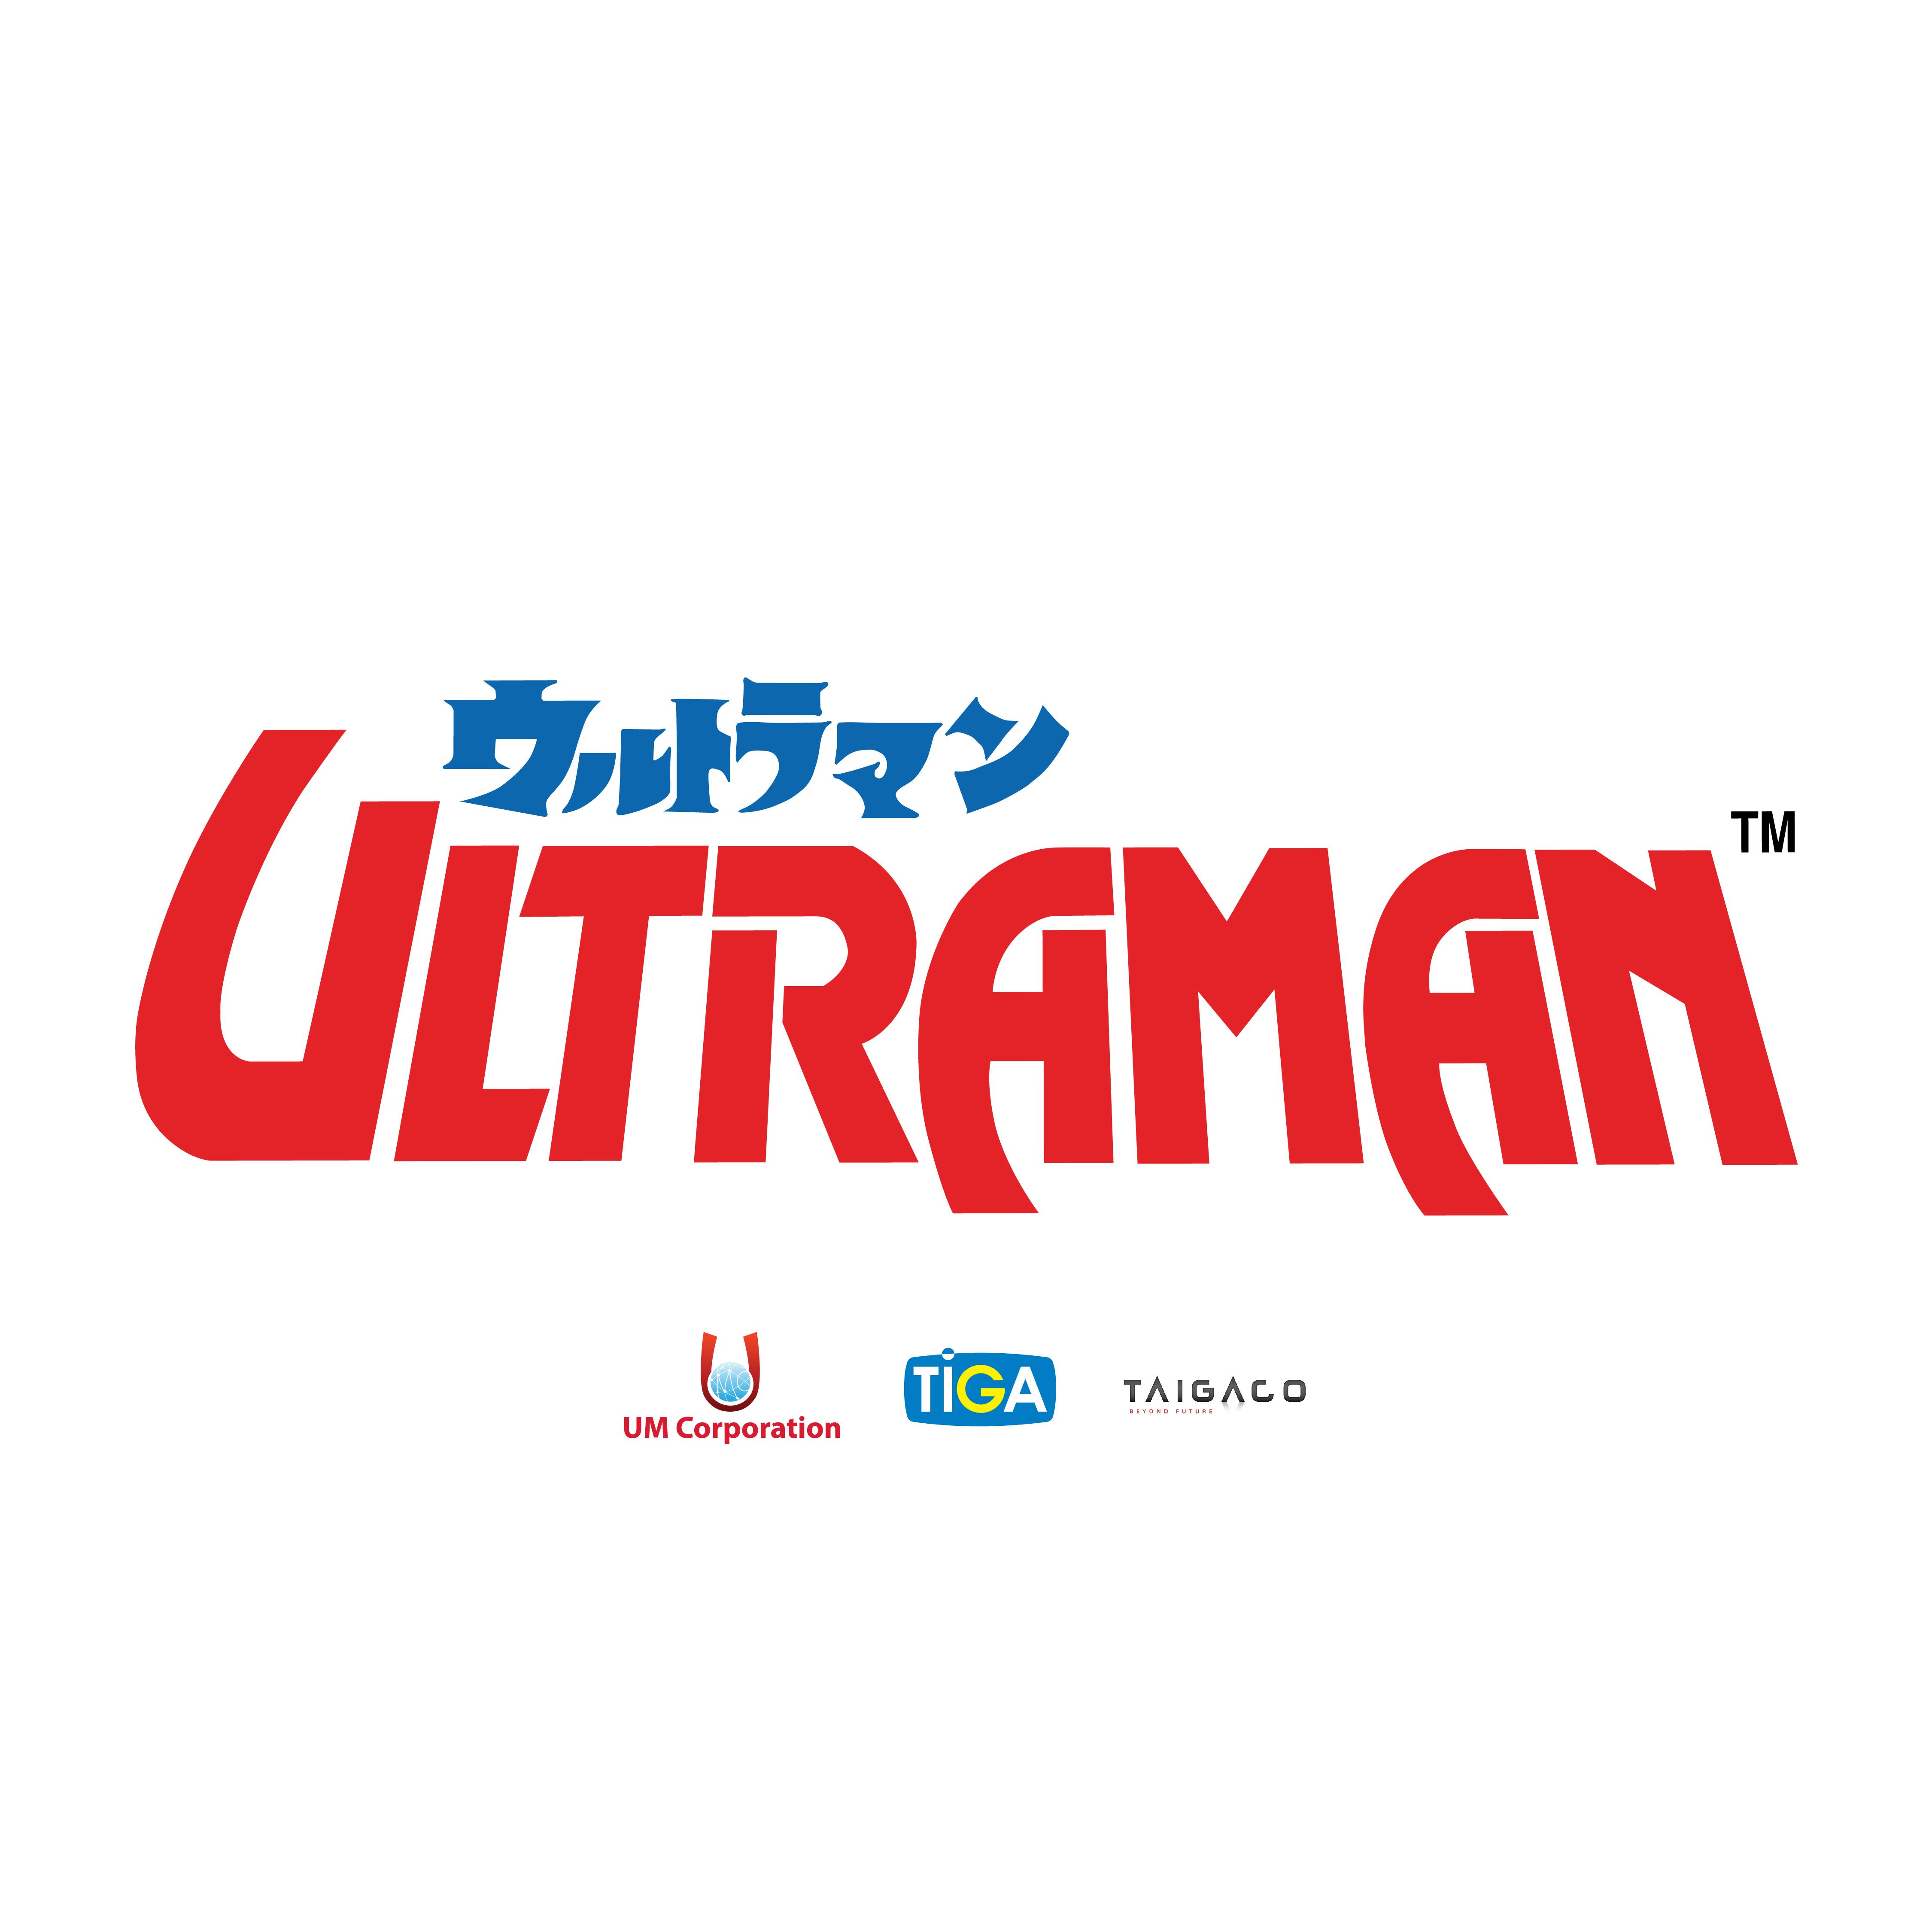 ultramanoriginal's avatar